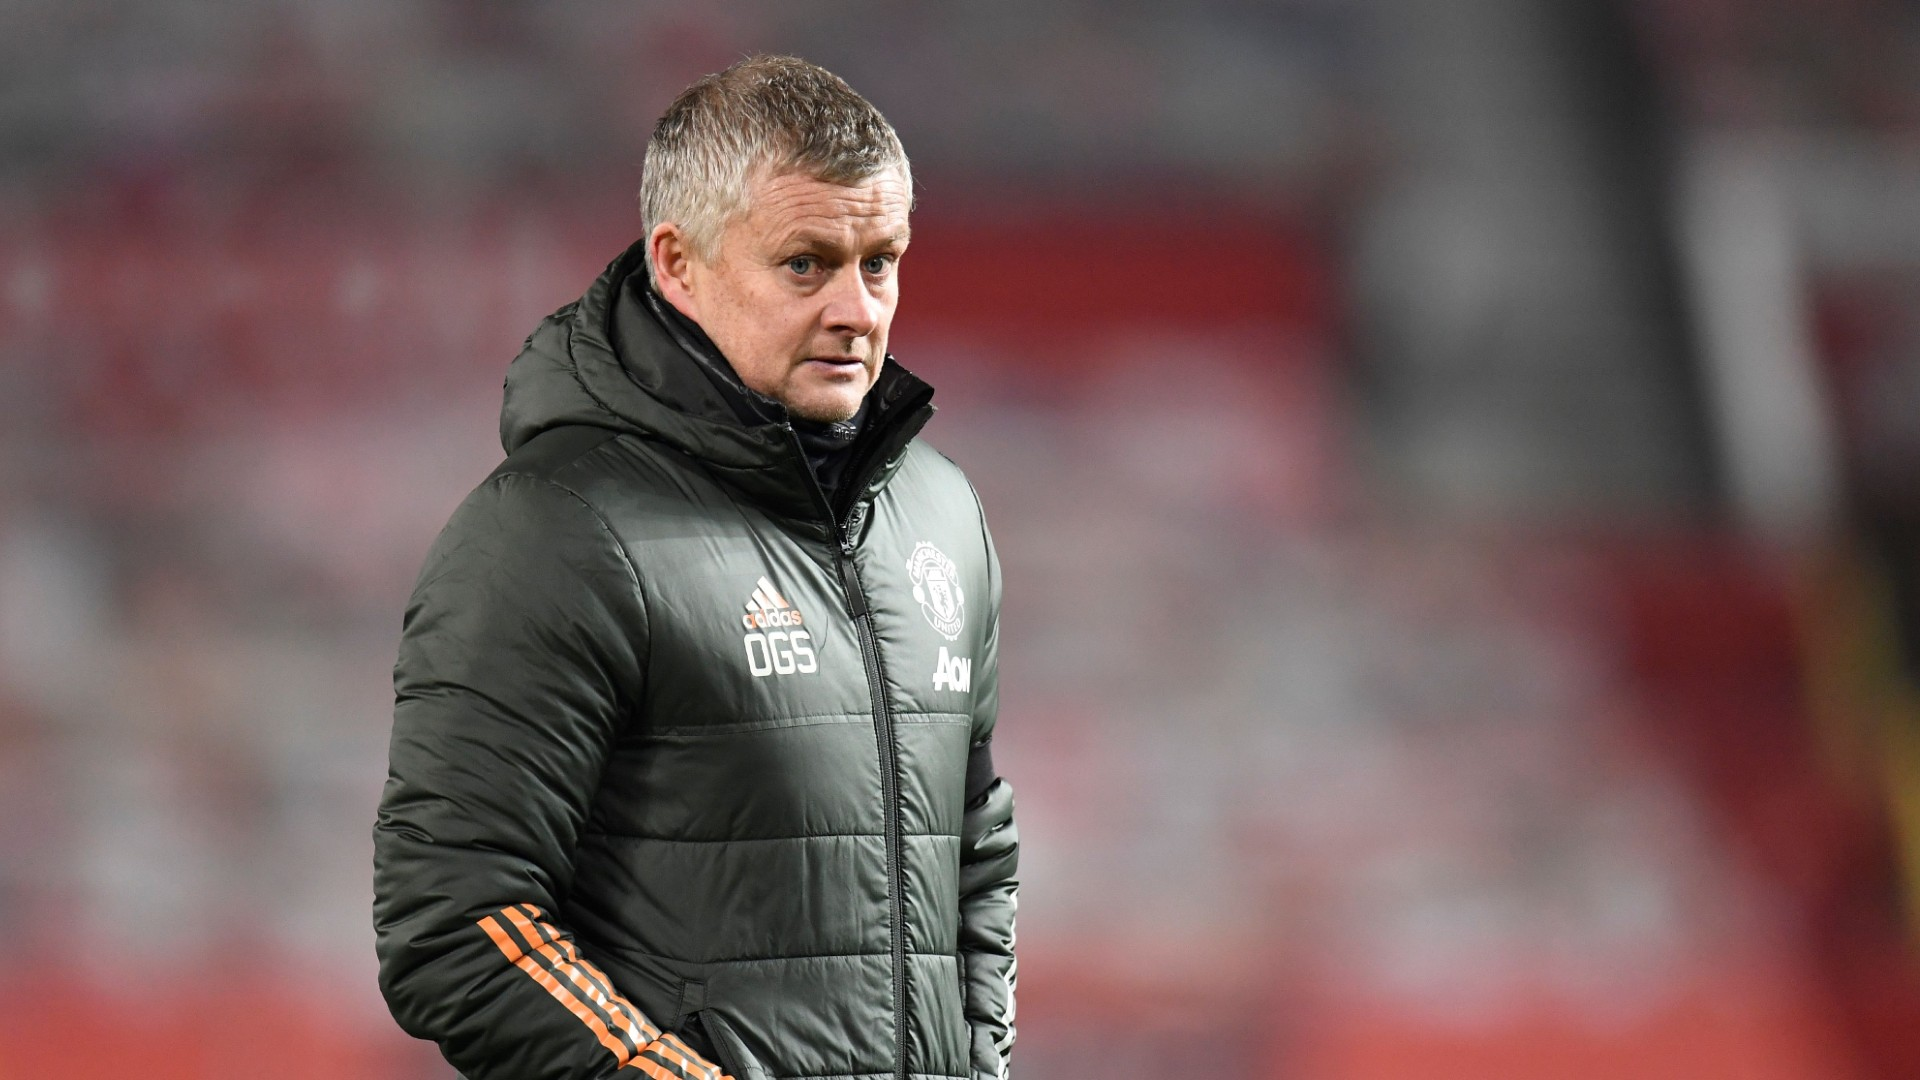 'We're not even halfway!' – Solskjaer not thinking about Man Utd Premier League title tilt